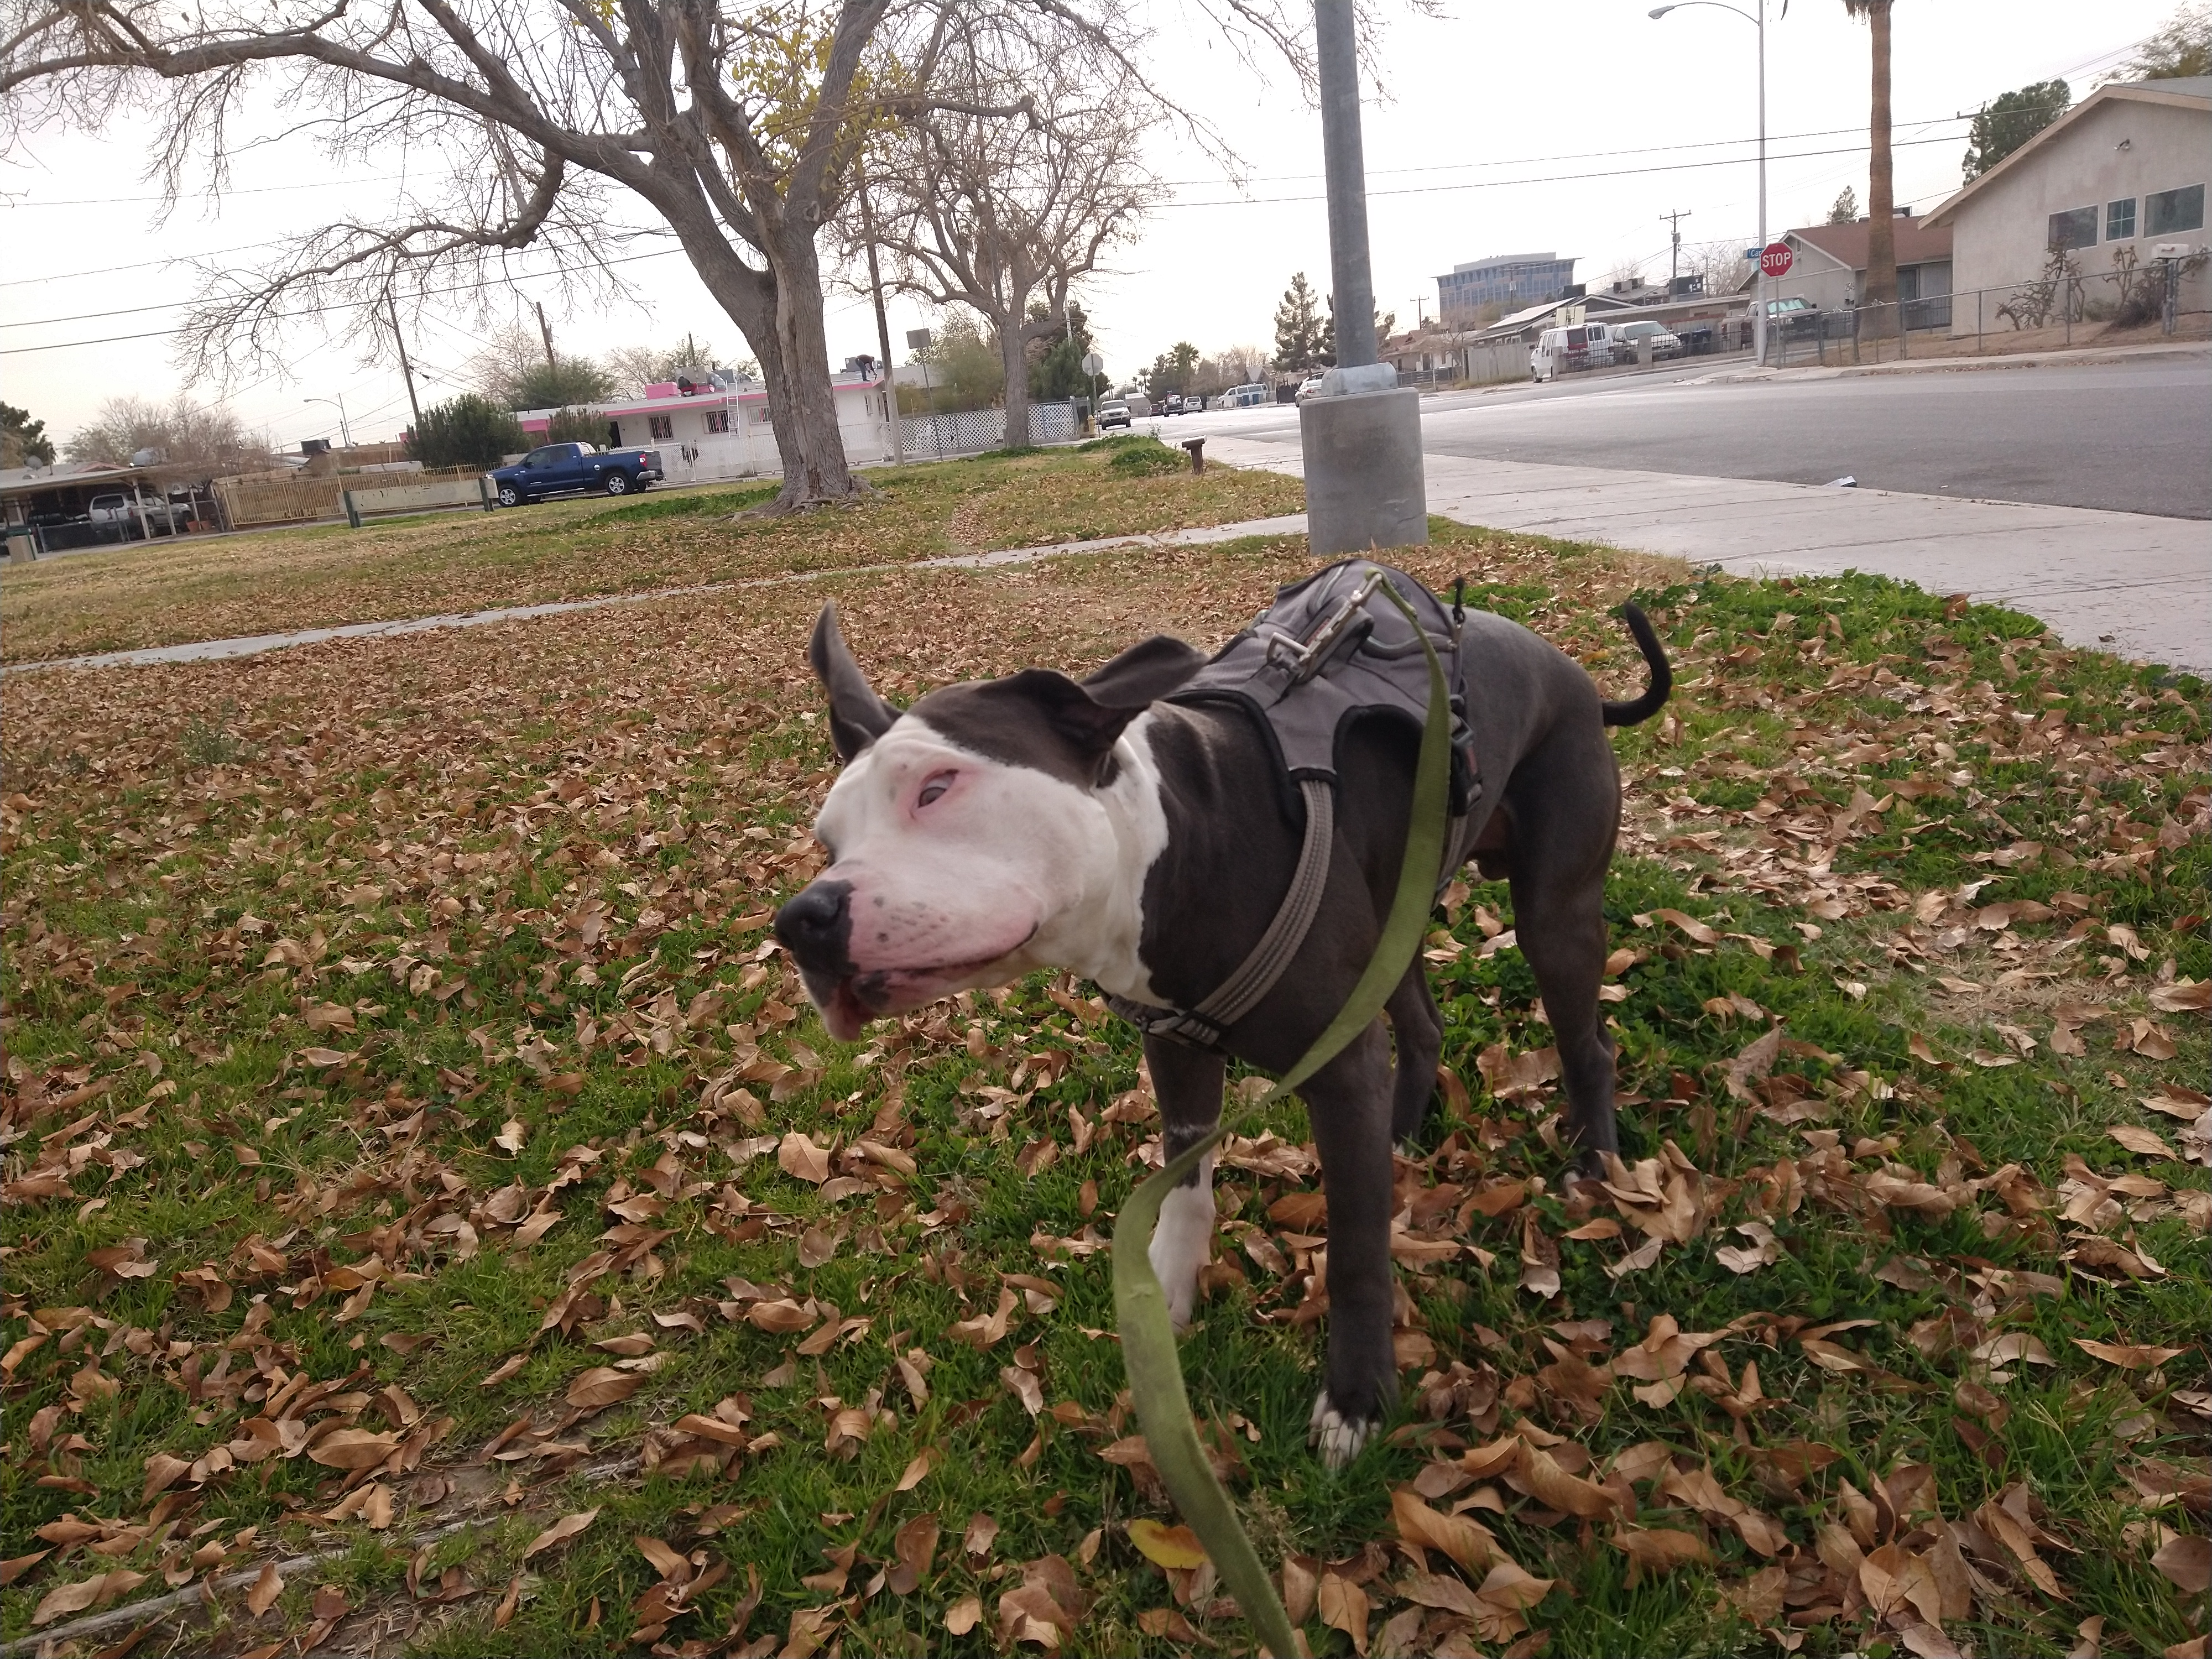 adoptable Dog in North Las Vegas,NV named Milo